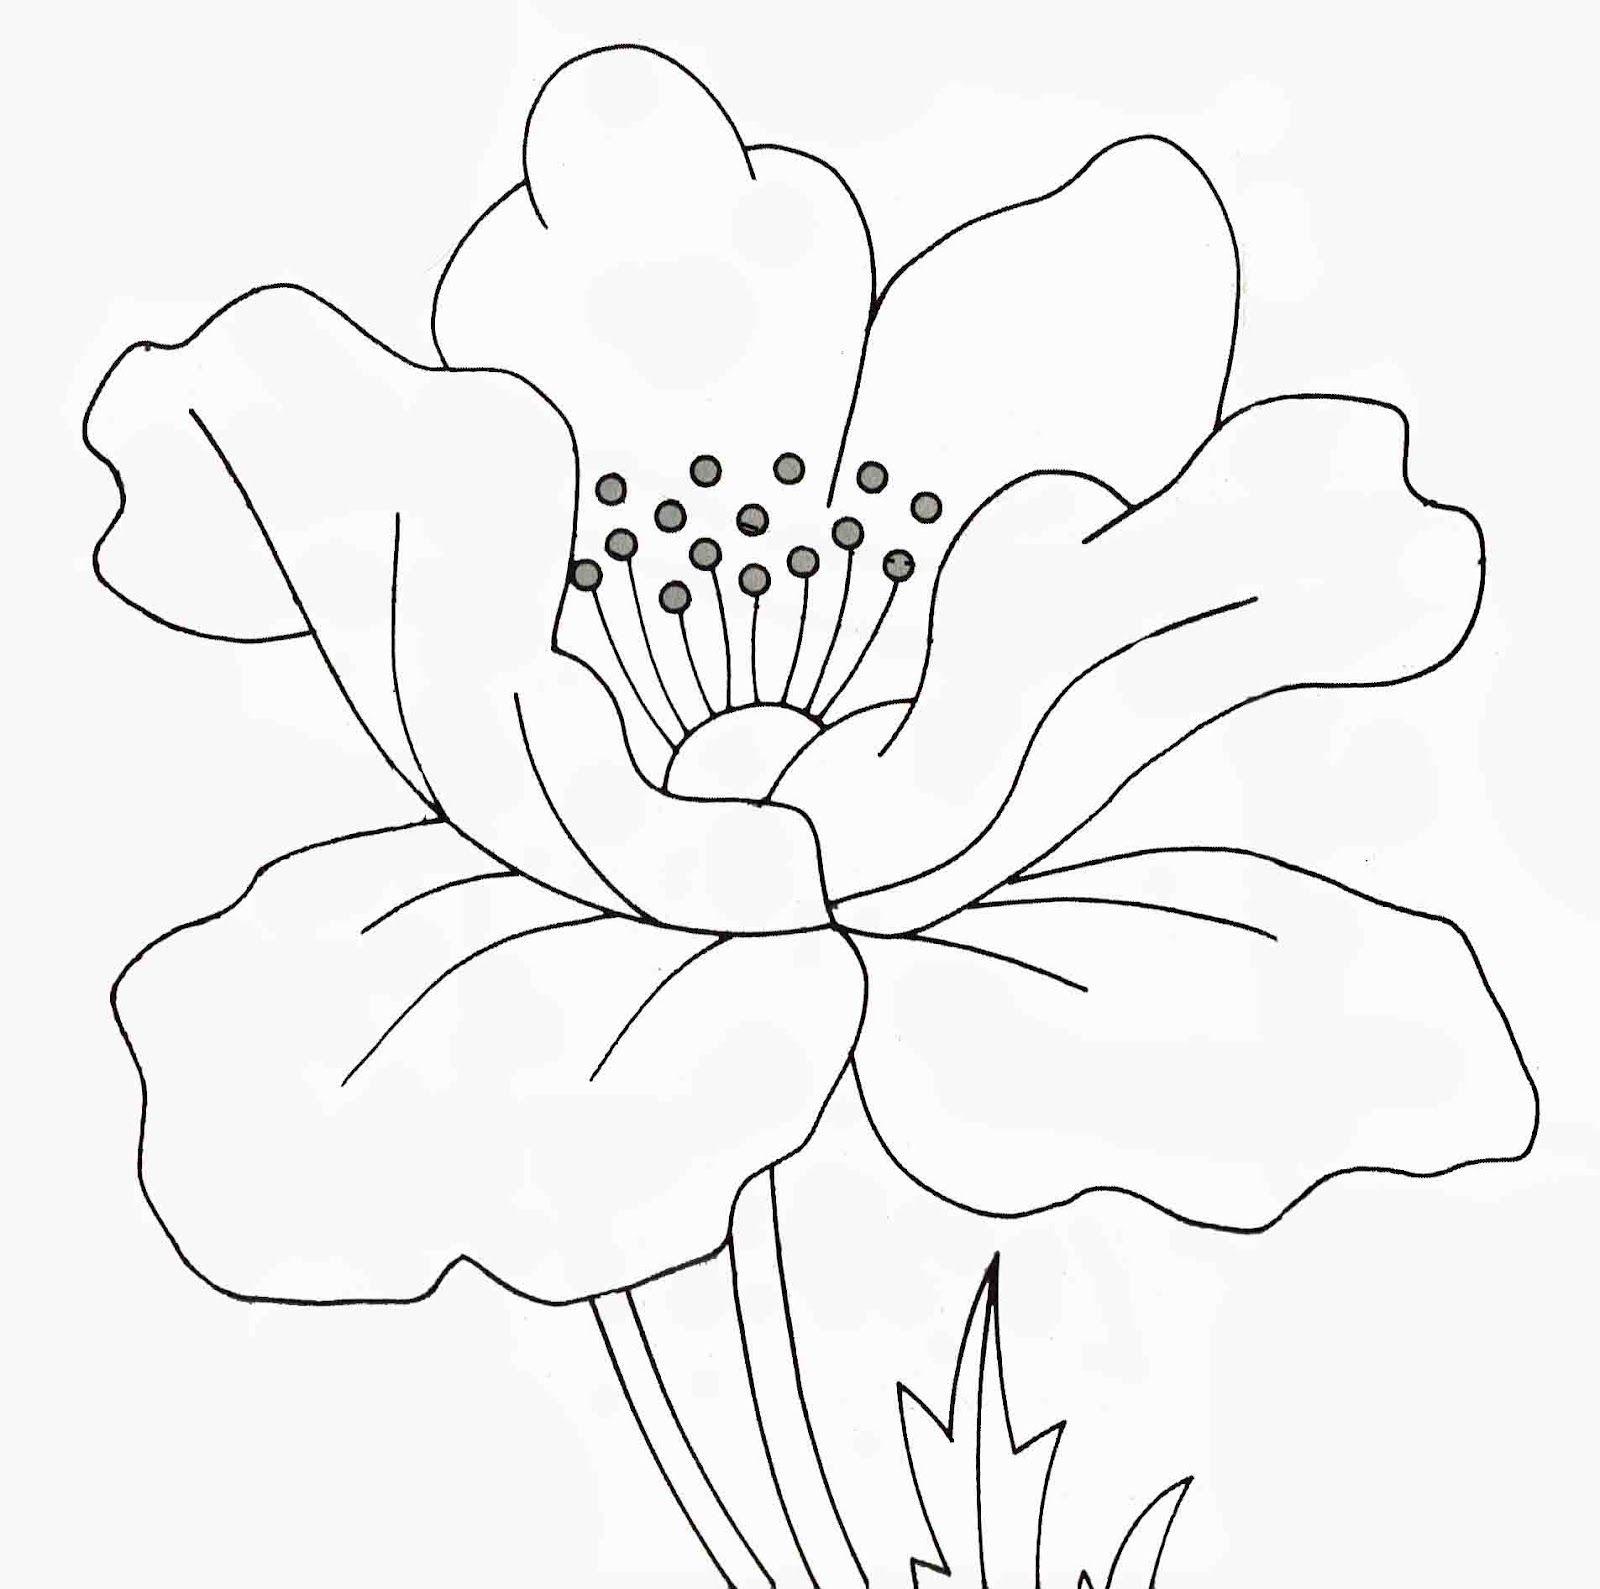 pintar telas   Flores   Pinterest   Pintar tela, Pintar y Tela